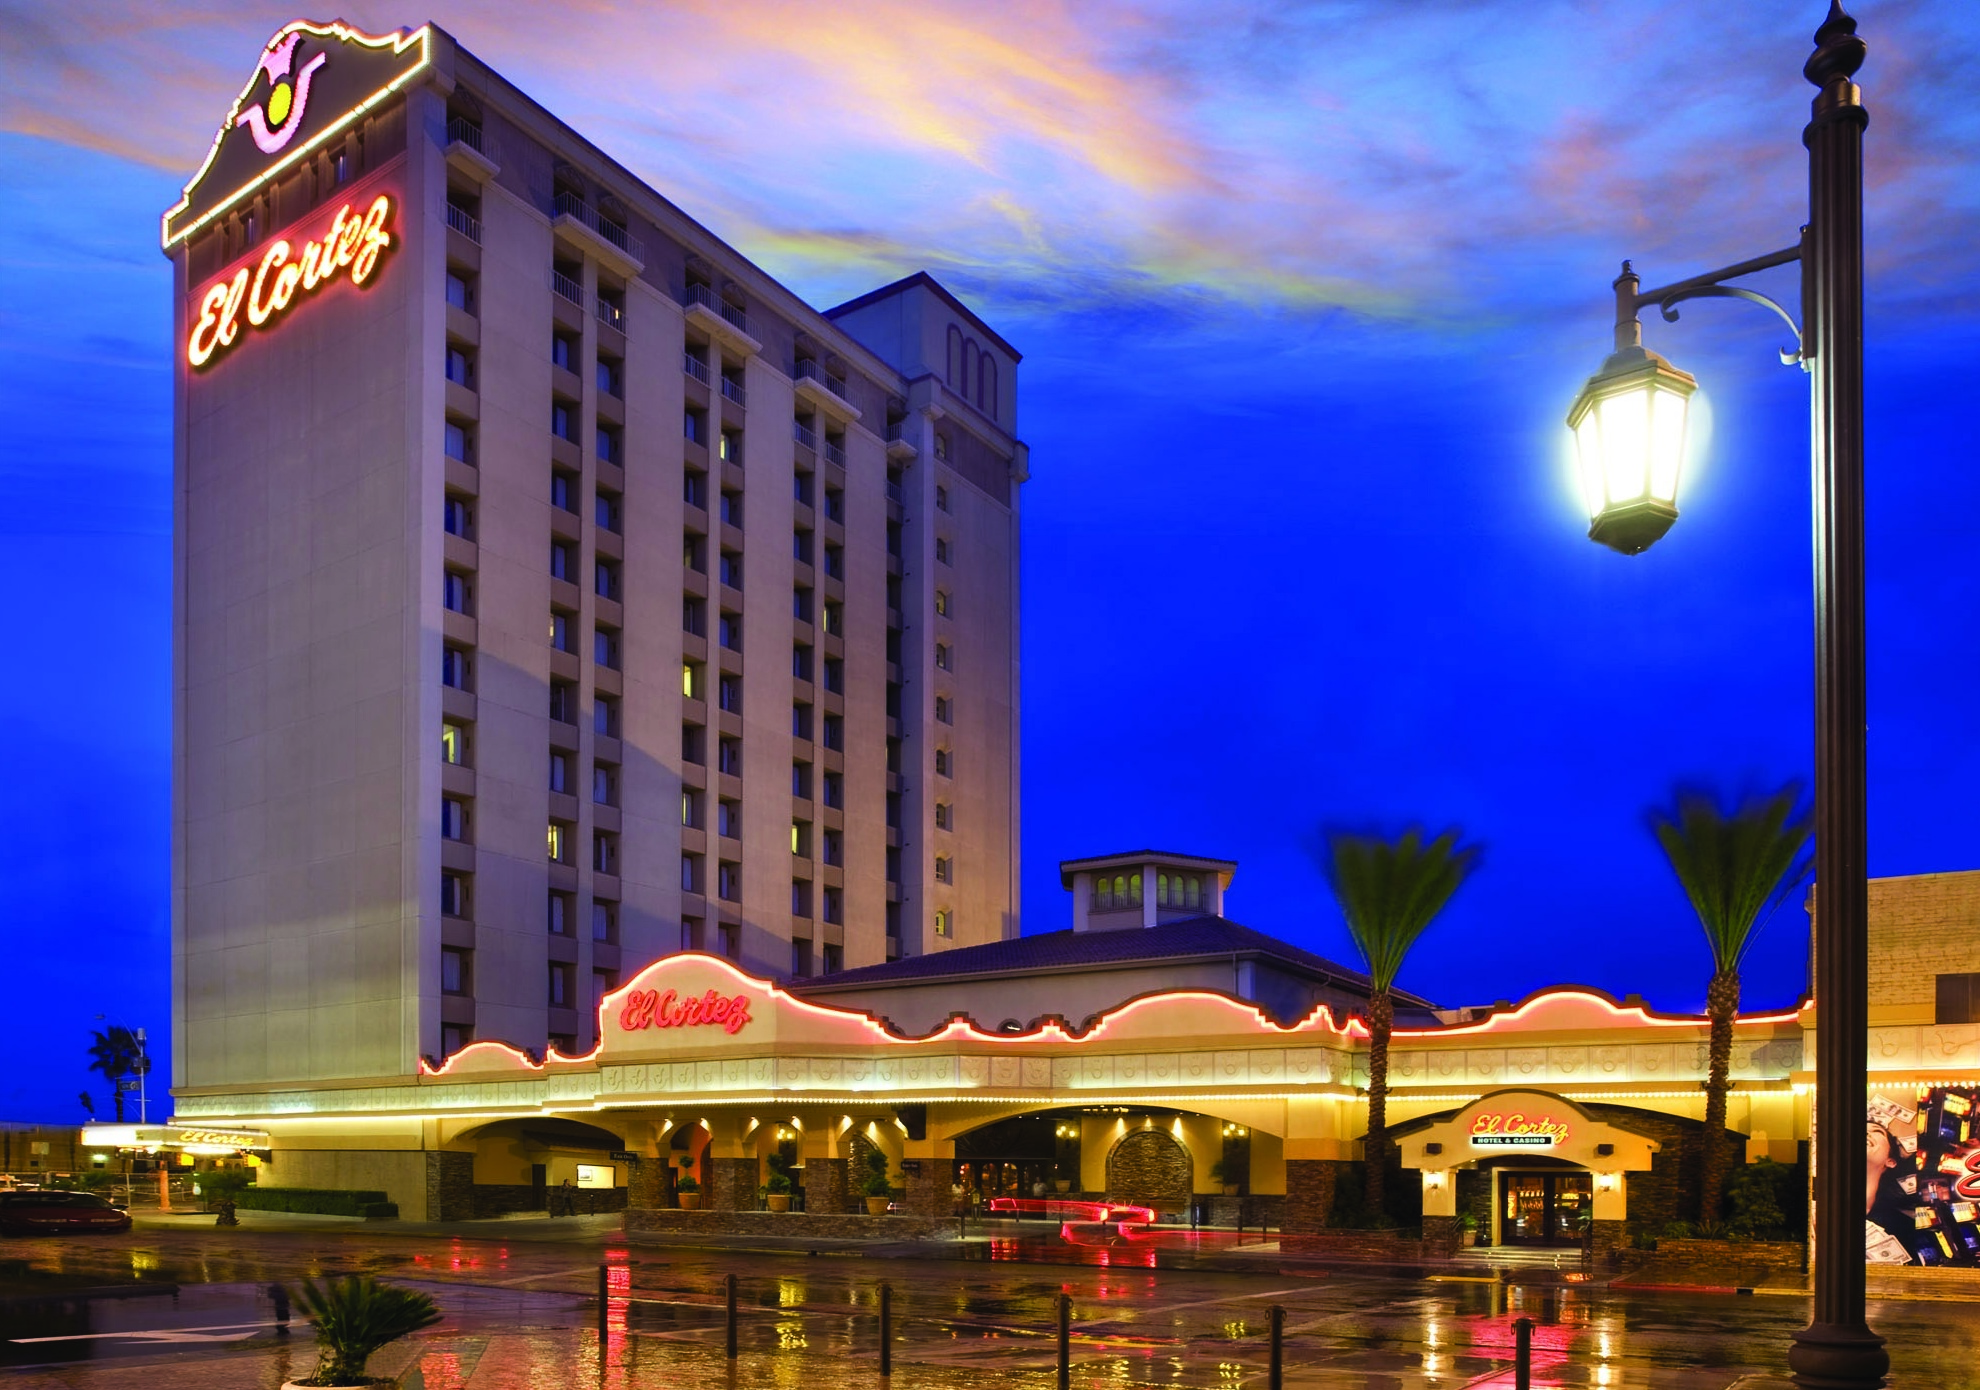 El cortez las vegas casino best best br casino casino gambling gambling